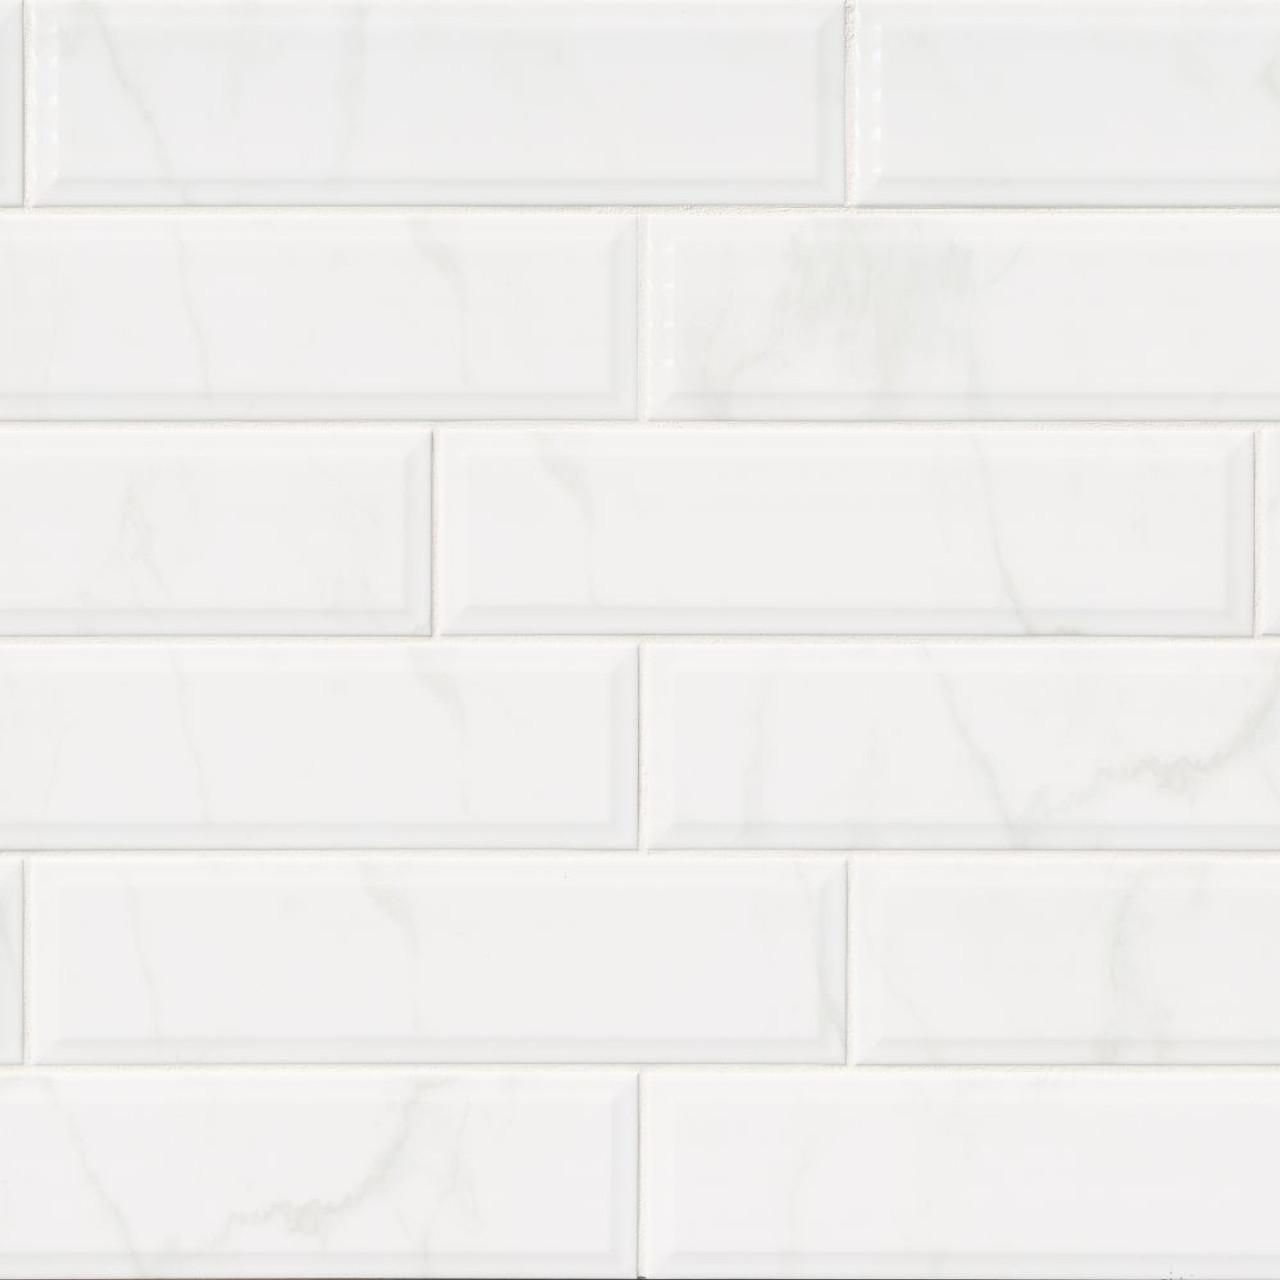 ms international backsplash series classique white carara 4x16 glossy beveled subway tile nwhicarglo4x16bev